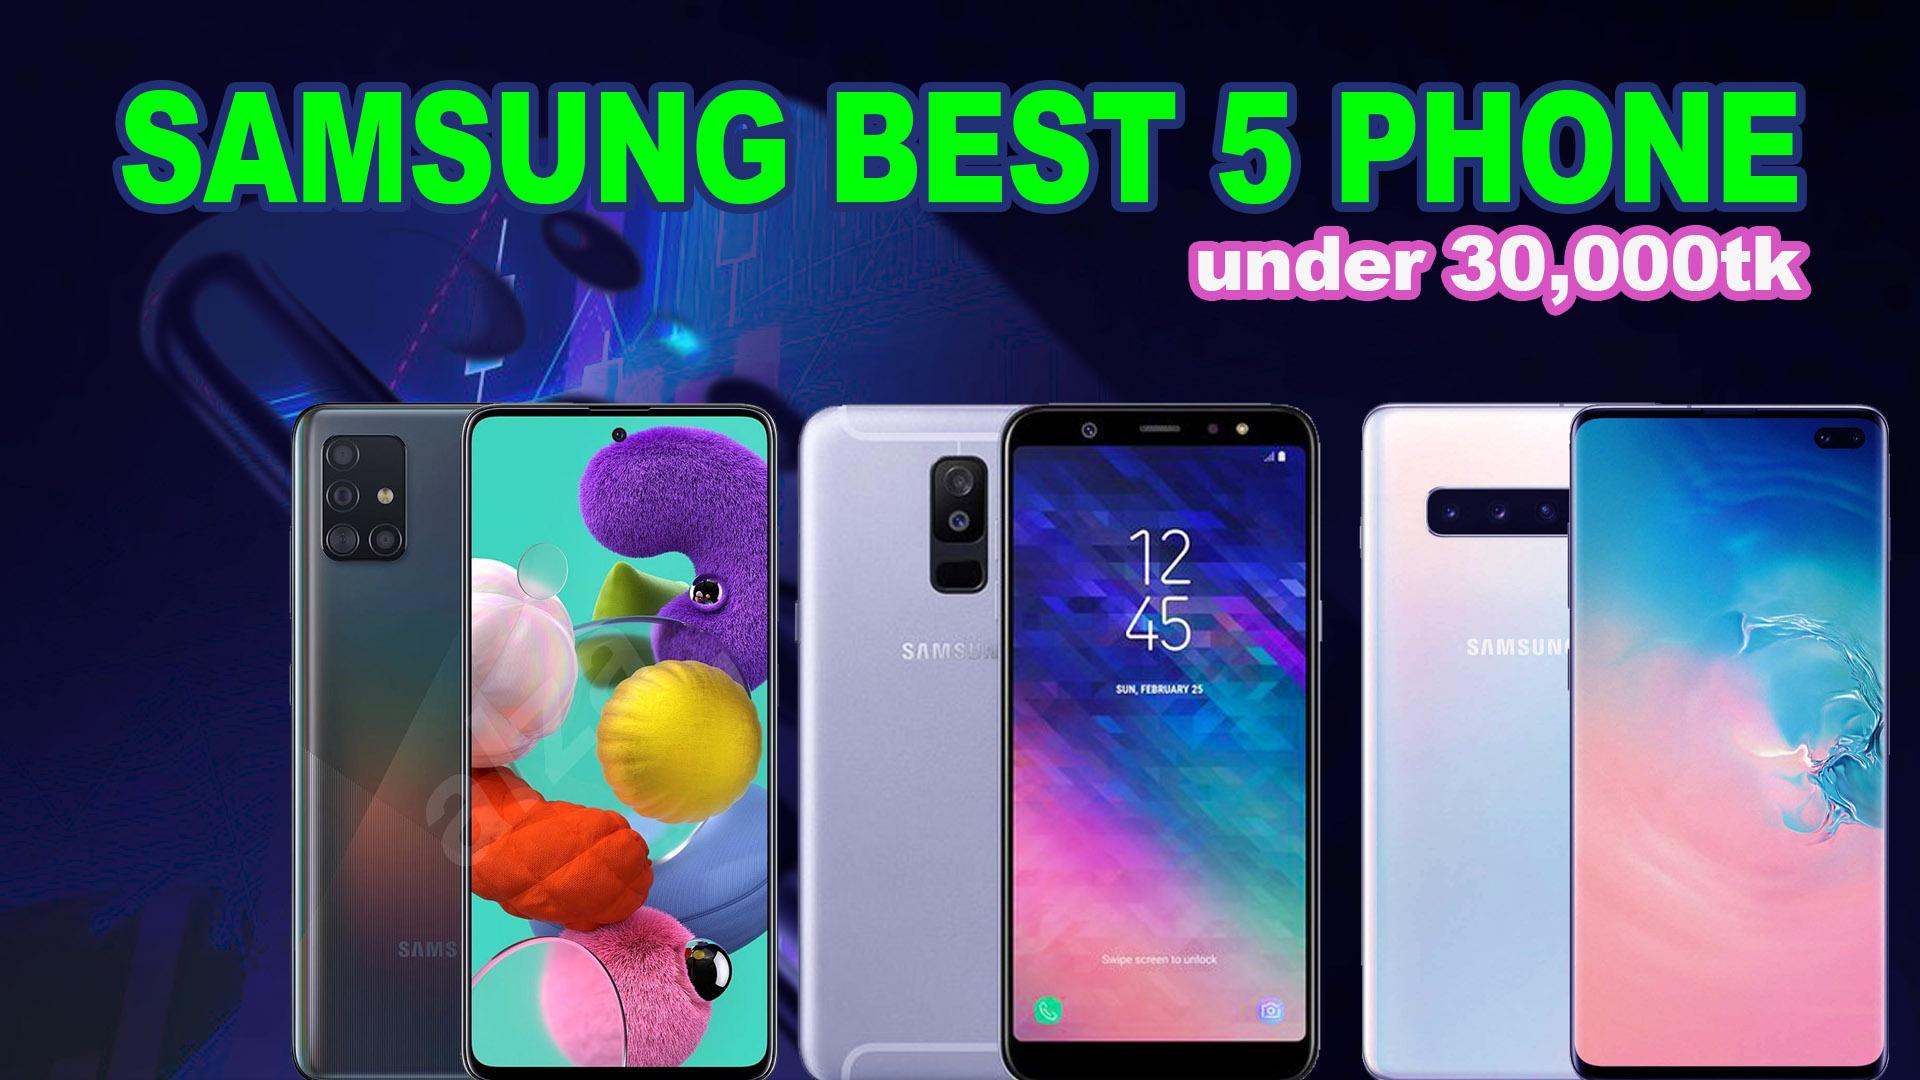 BEST 5 SAMSUNG PHONE PEICE IN BANDLEDESH